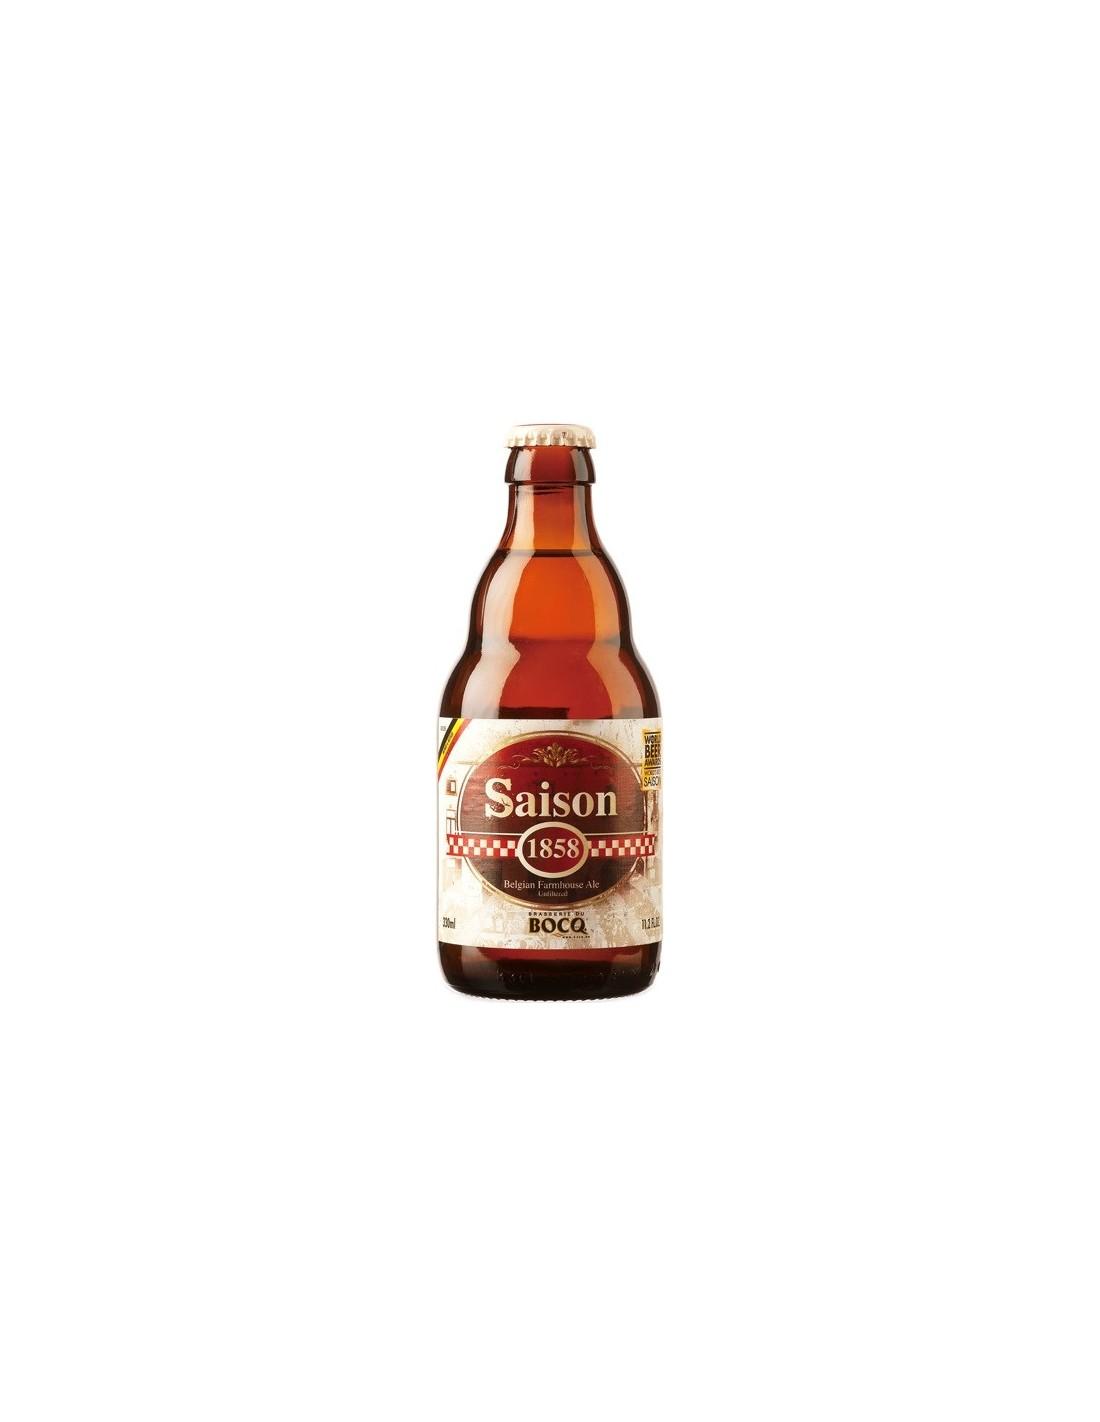 Bere blonda Saison 1858, 6.4% alc., 0.33L, Belgia